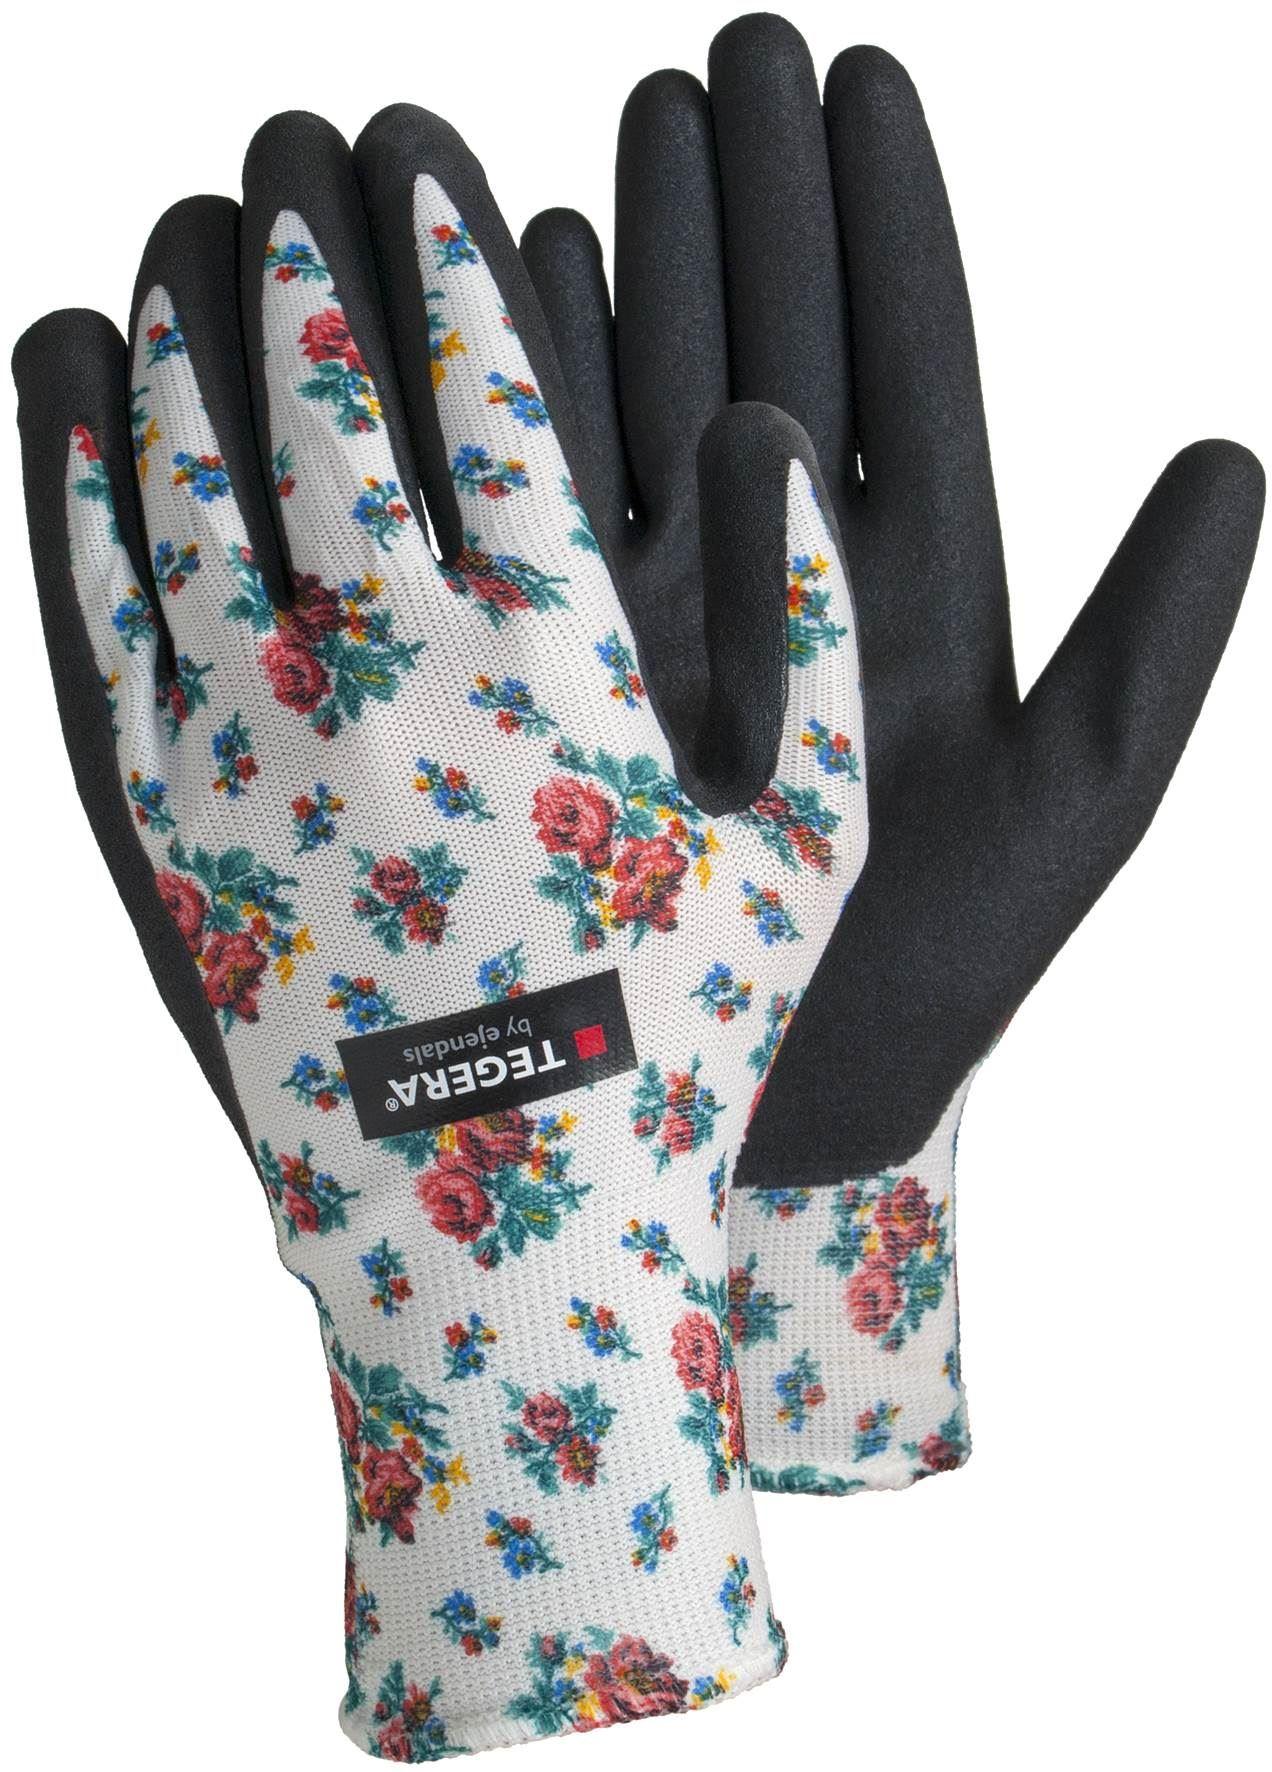 Tegera ladies womens gardening gloves nitrile letex free for Gardening gloves ladies